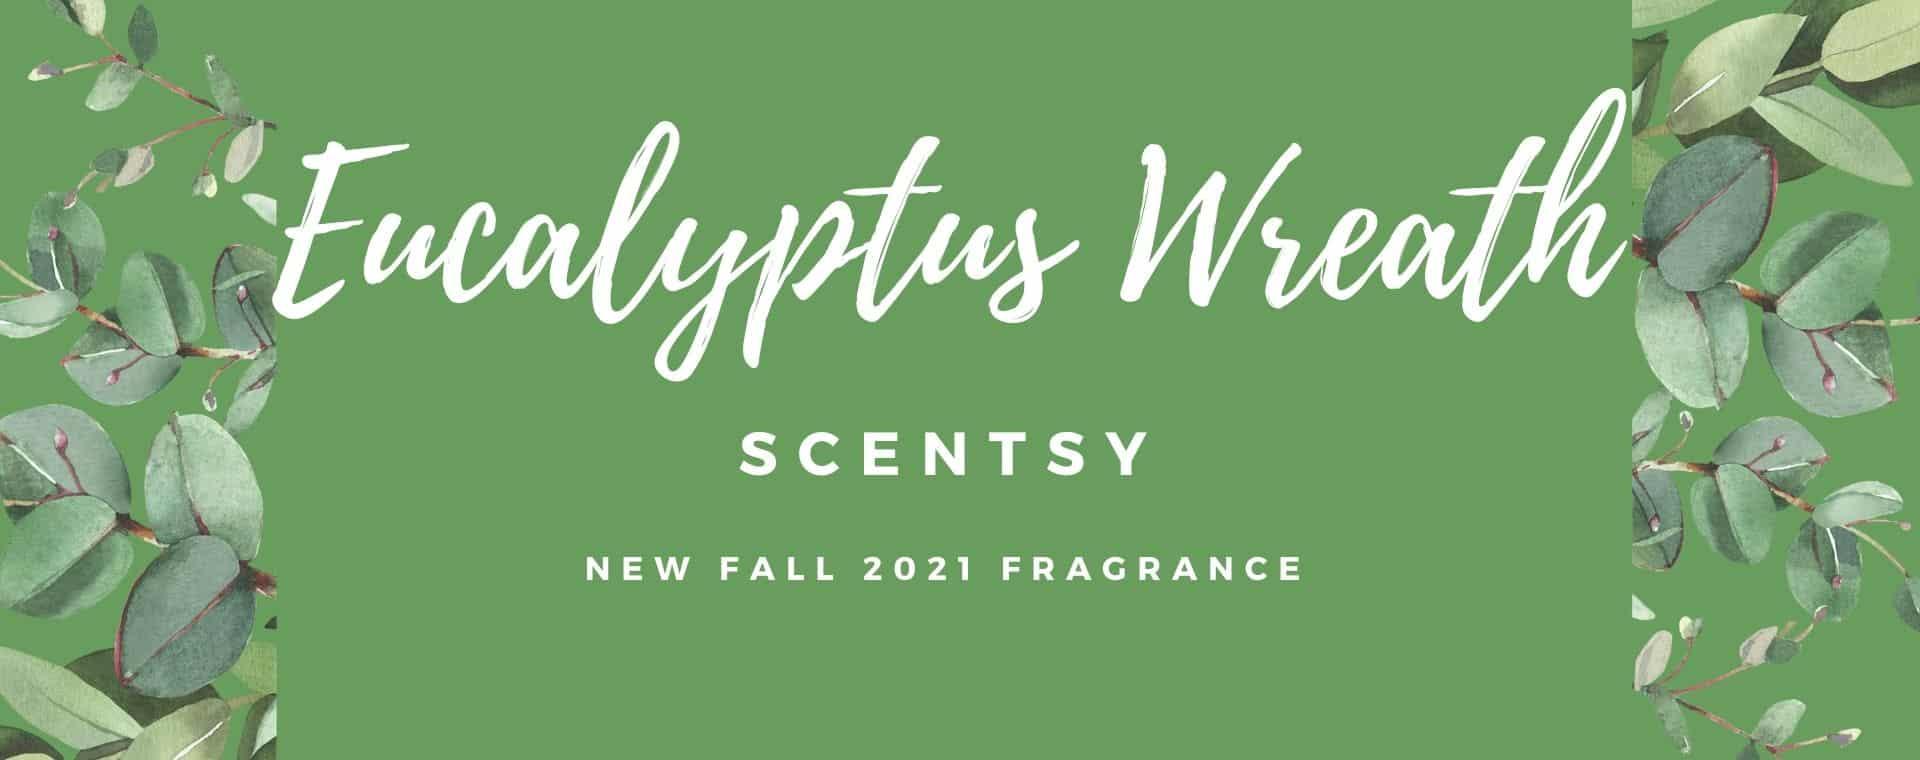 Eucalyptus Wreath Scentsy Fragrance